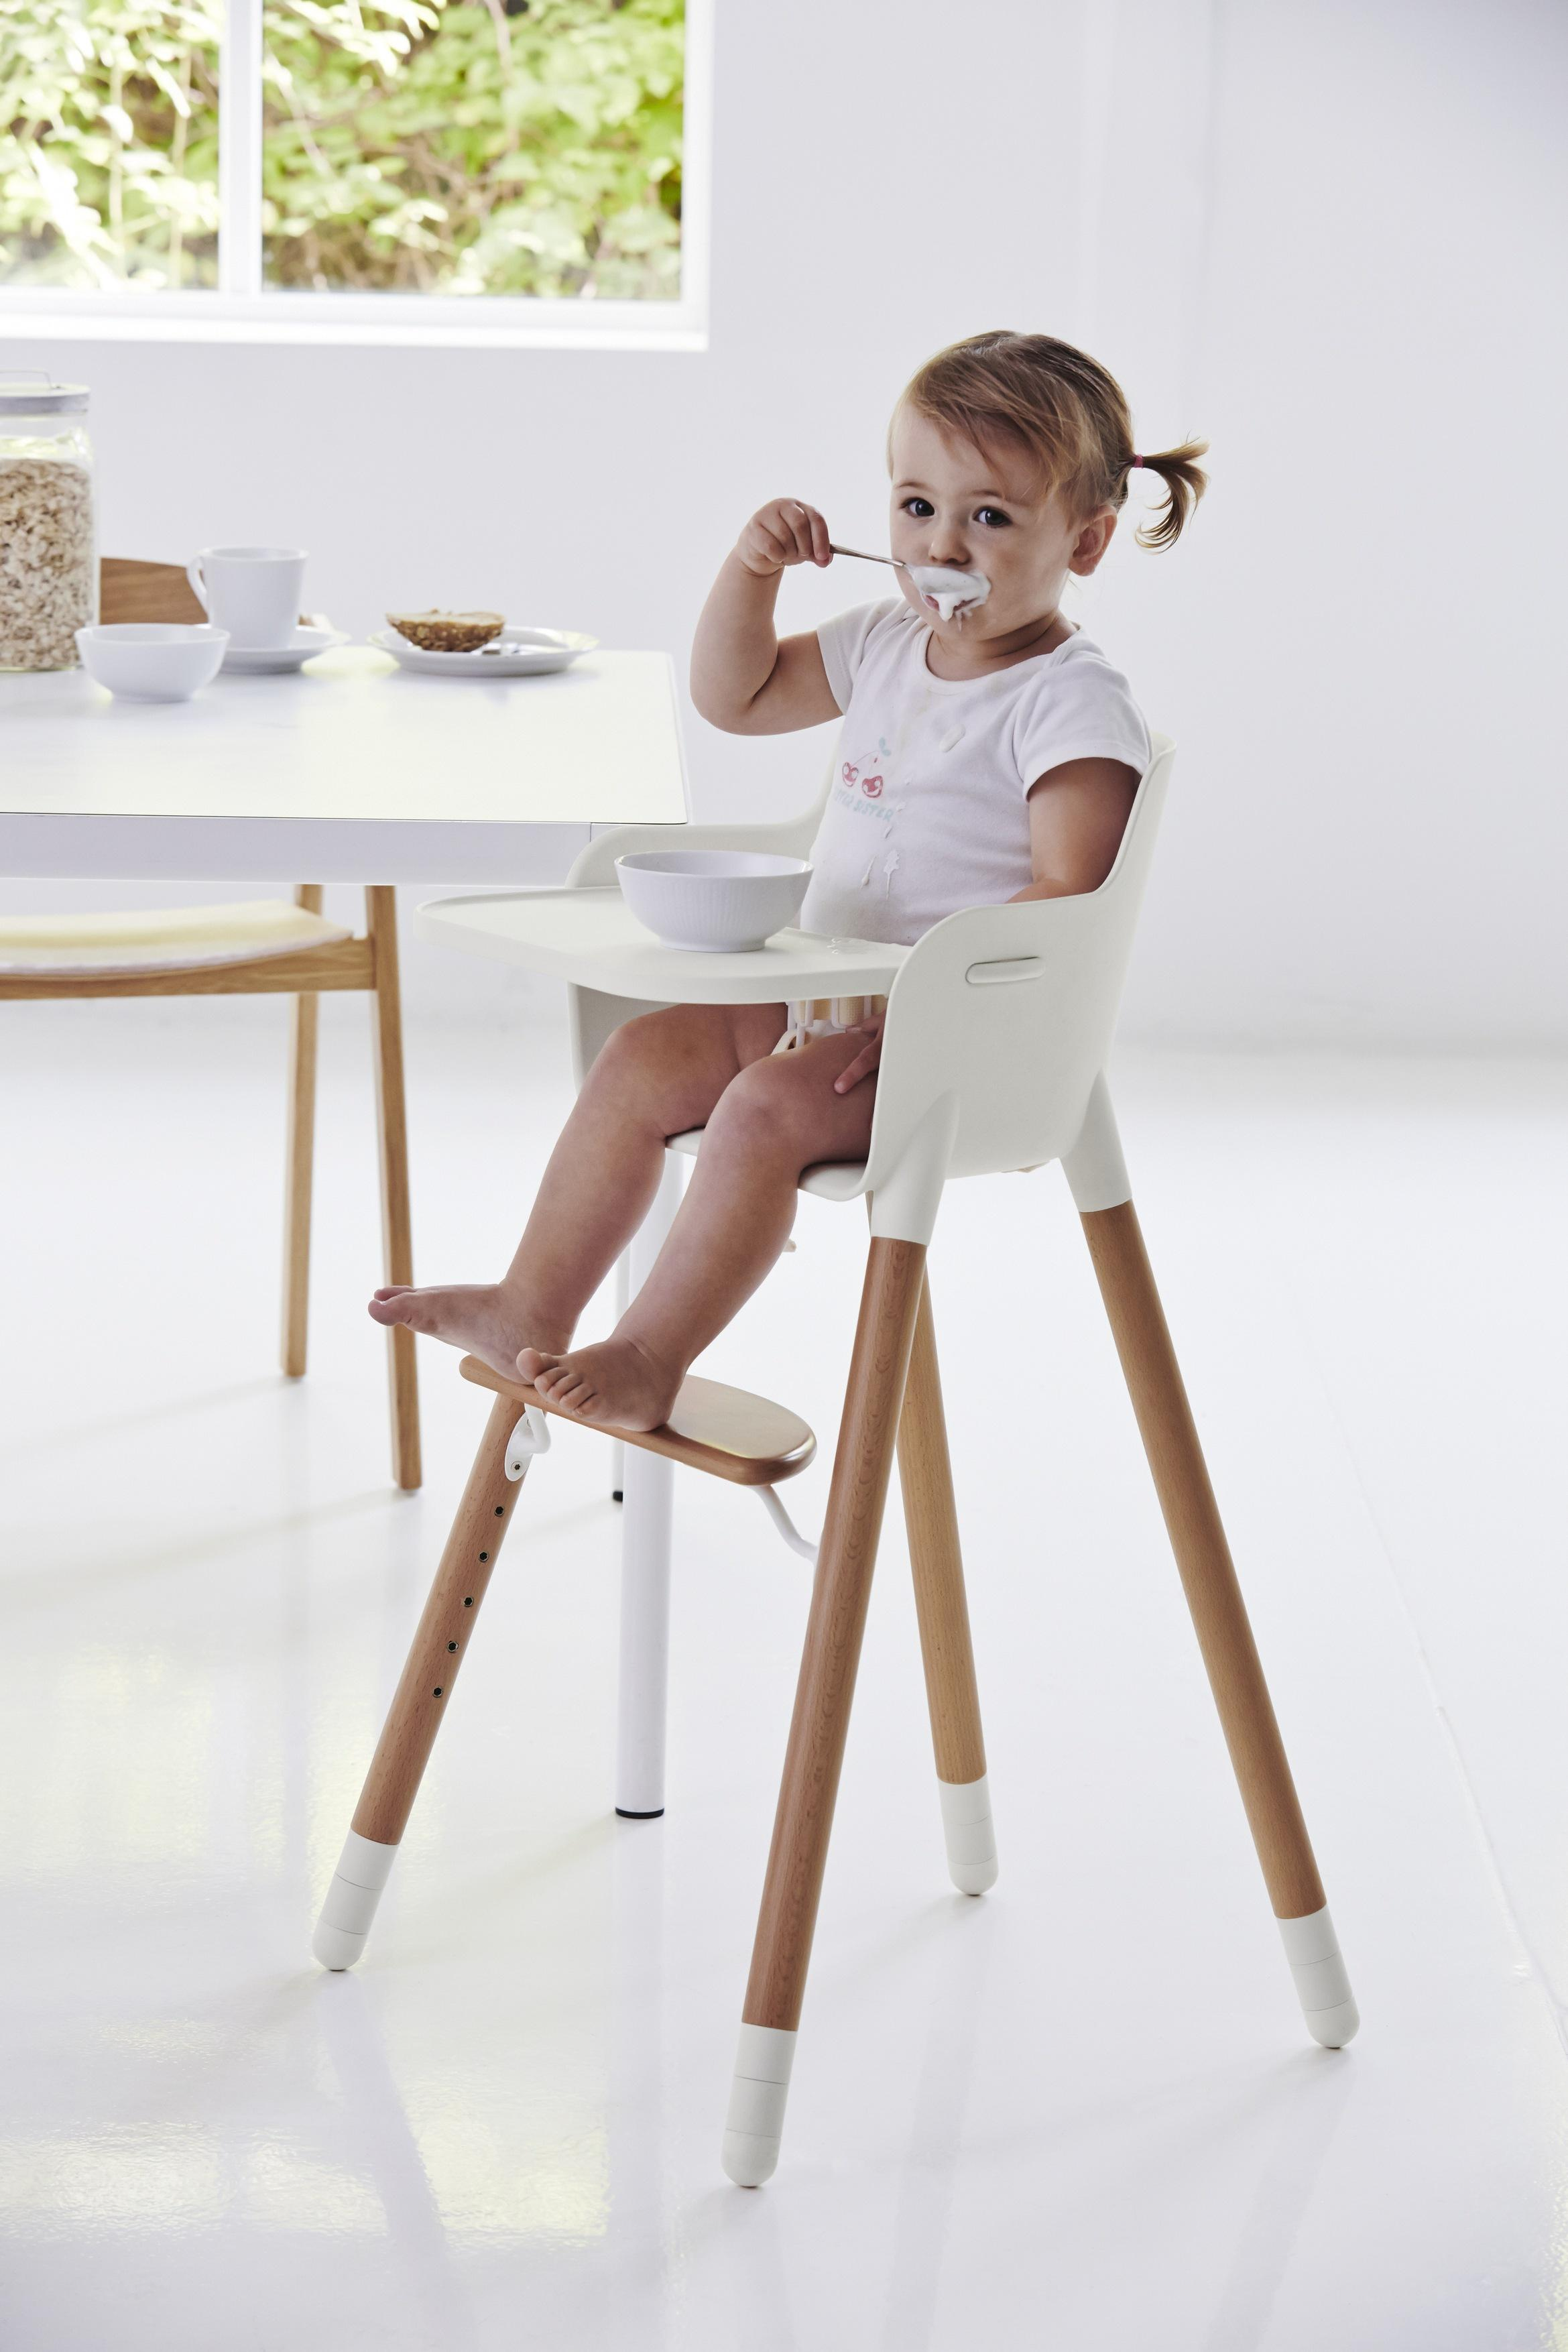 Chambre b b lits bois evolutif flexa design scandinave belgique flexa bruxelles - Chaise haute scandinave bebe ...